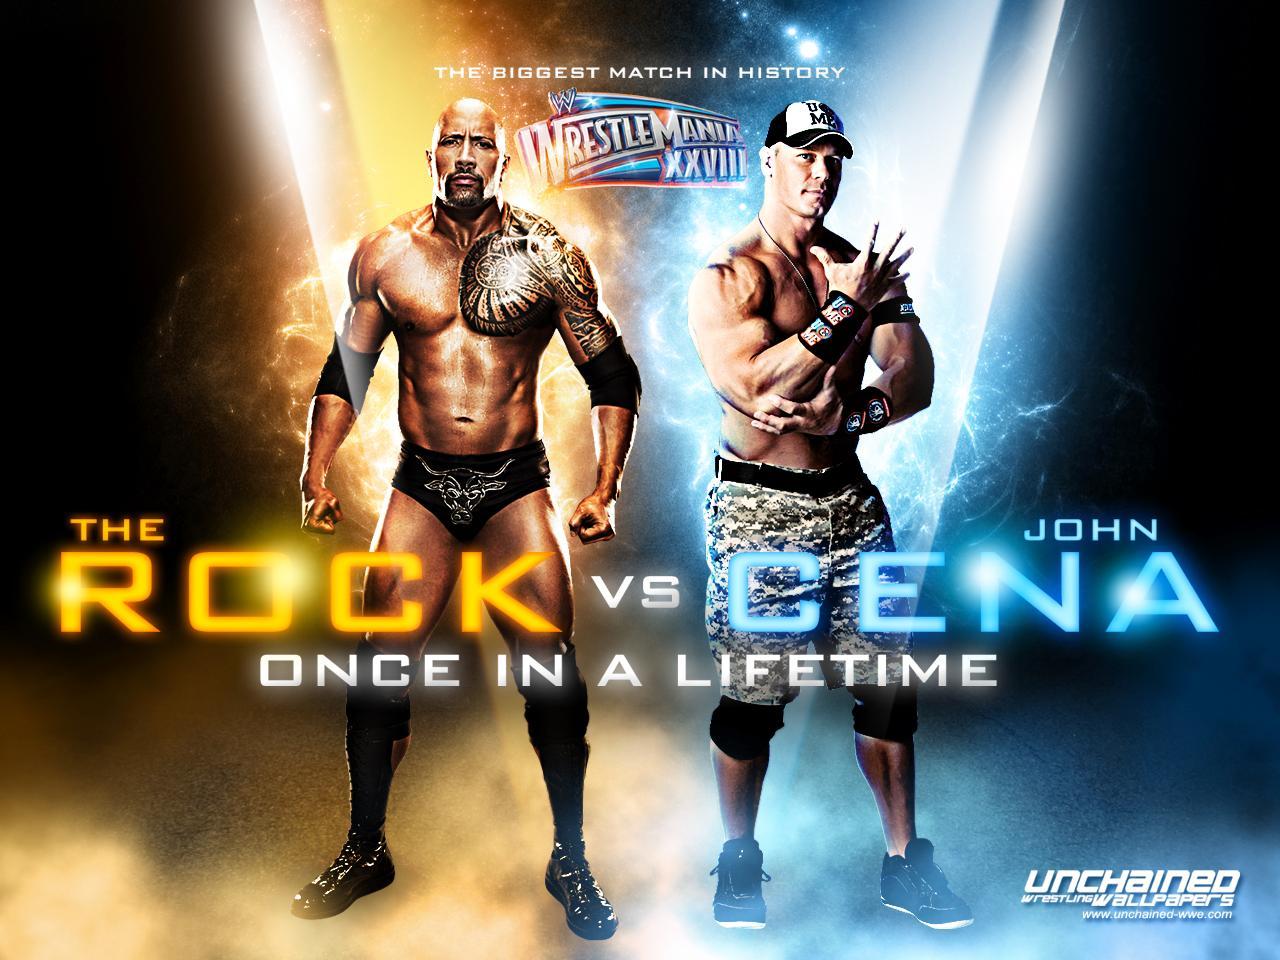 Download Wwe John Cena Hd Wallpapers 50   Wallpaper For 1280x960